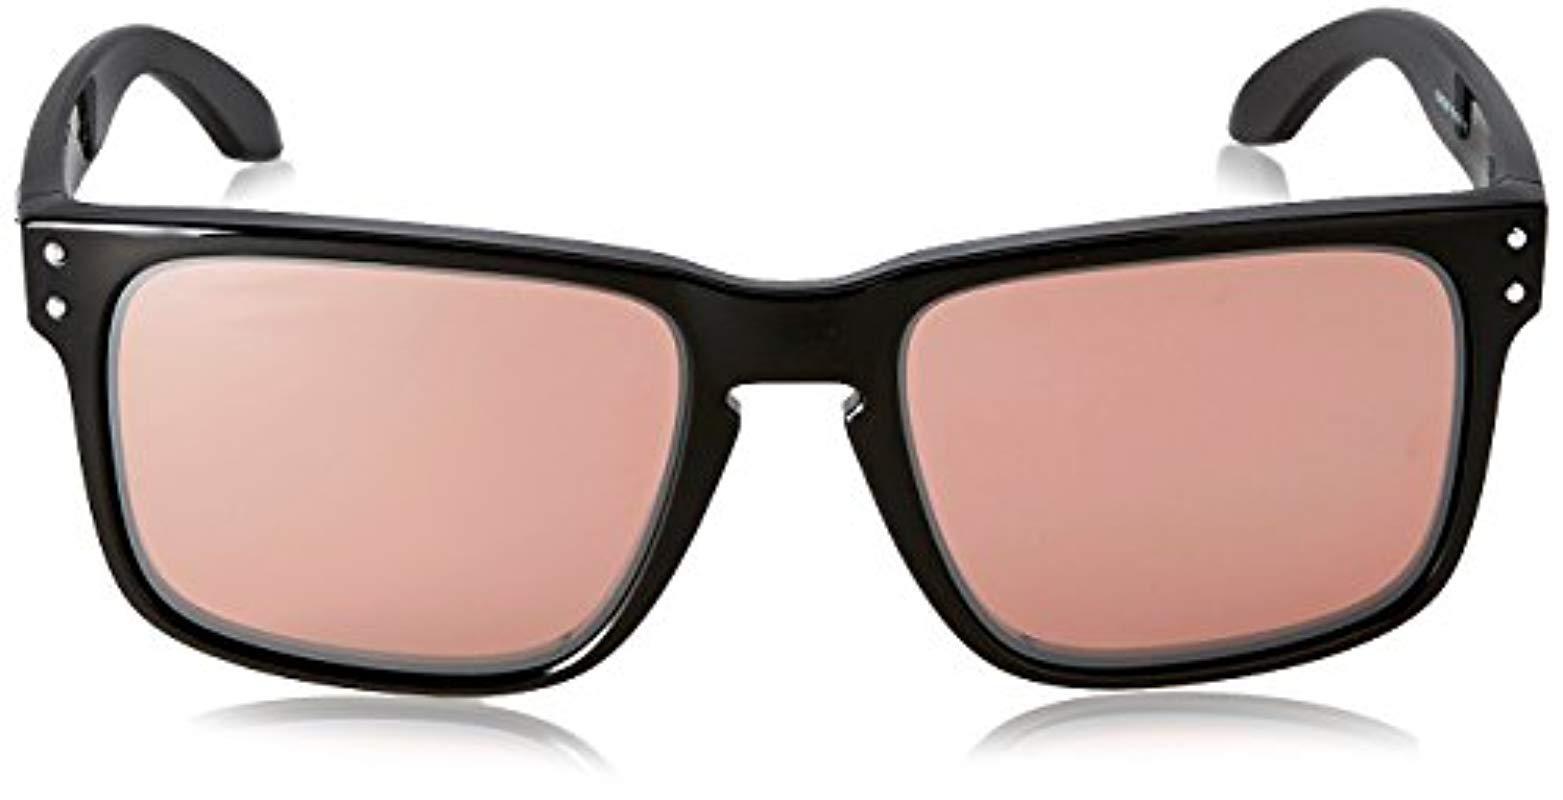 e0a027a42fcb8 Oakley - Black Holbrook Non-polarized Iridium Rectangular Sunglasses for  Men - Lyst. View fullscreen